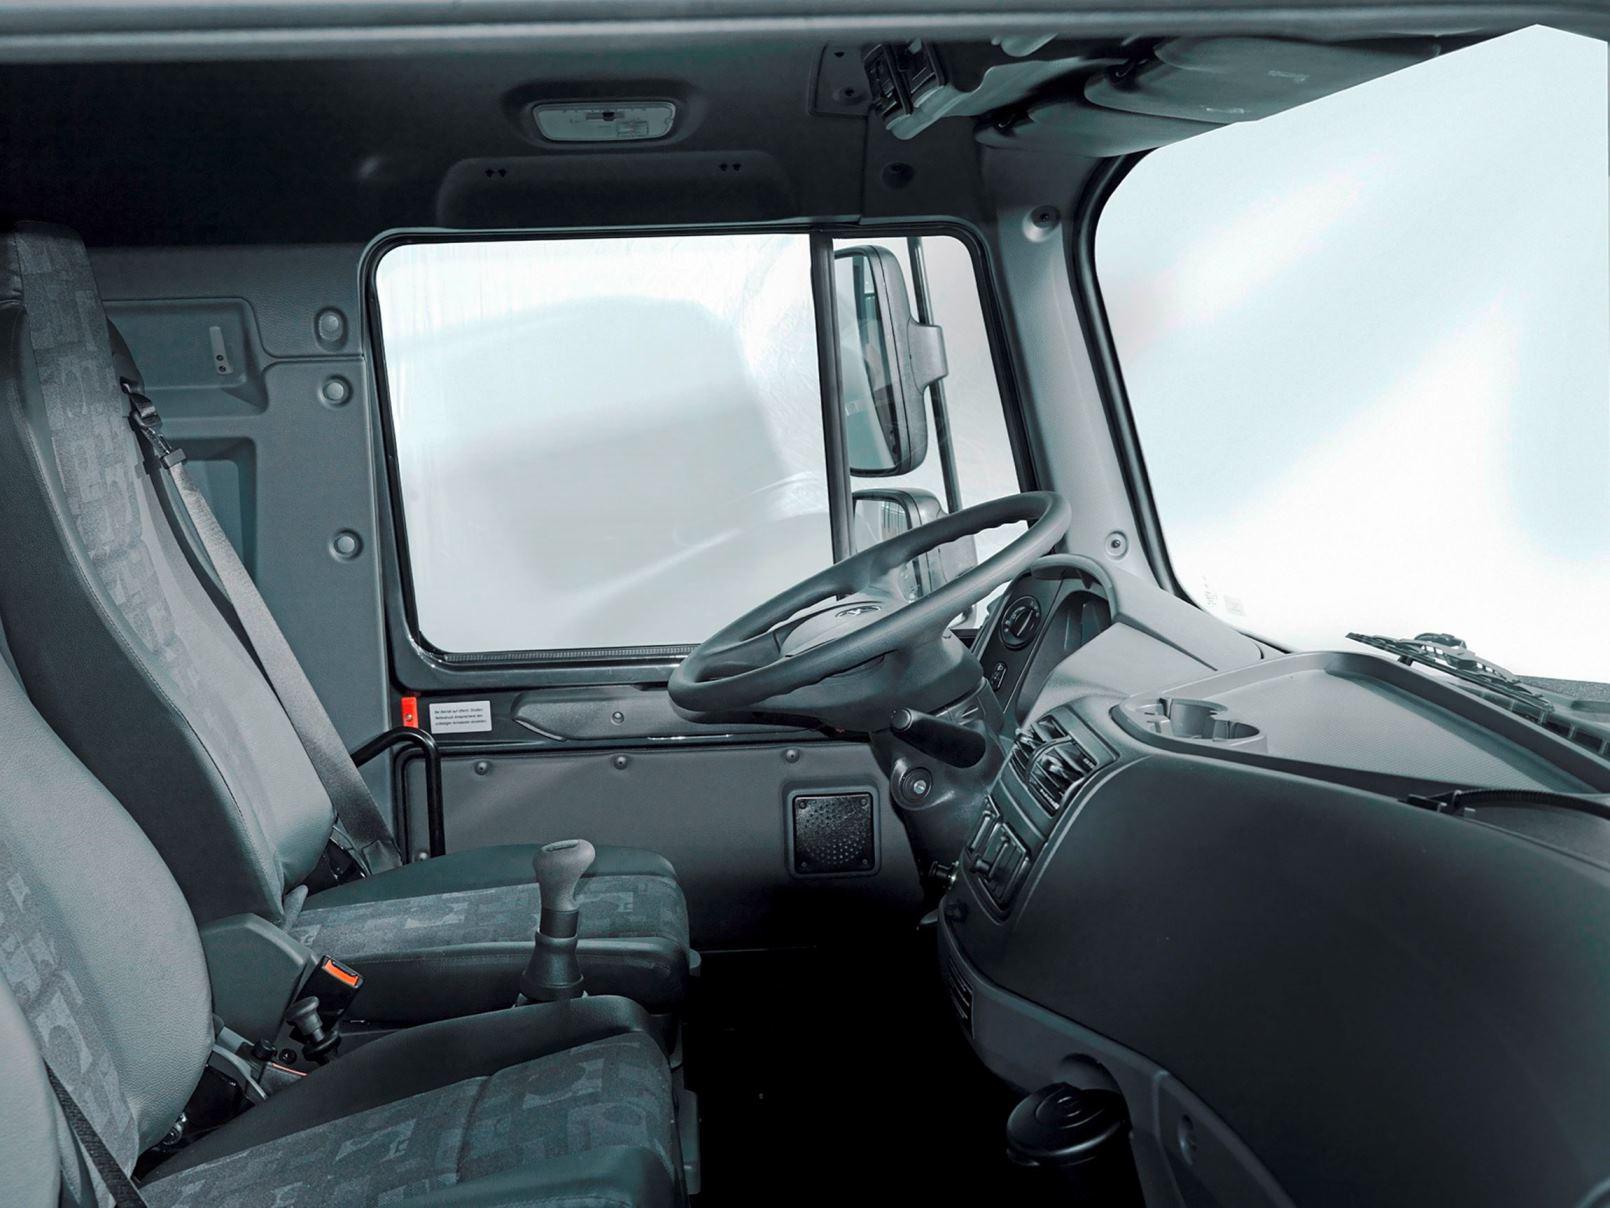 2016 mercedes benz zetros next gen heavy hauler combines for Camion americain interieur cabine